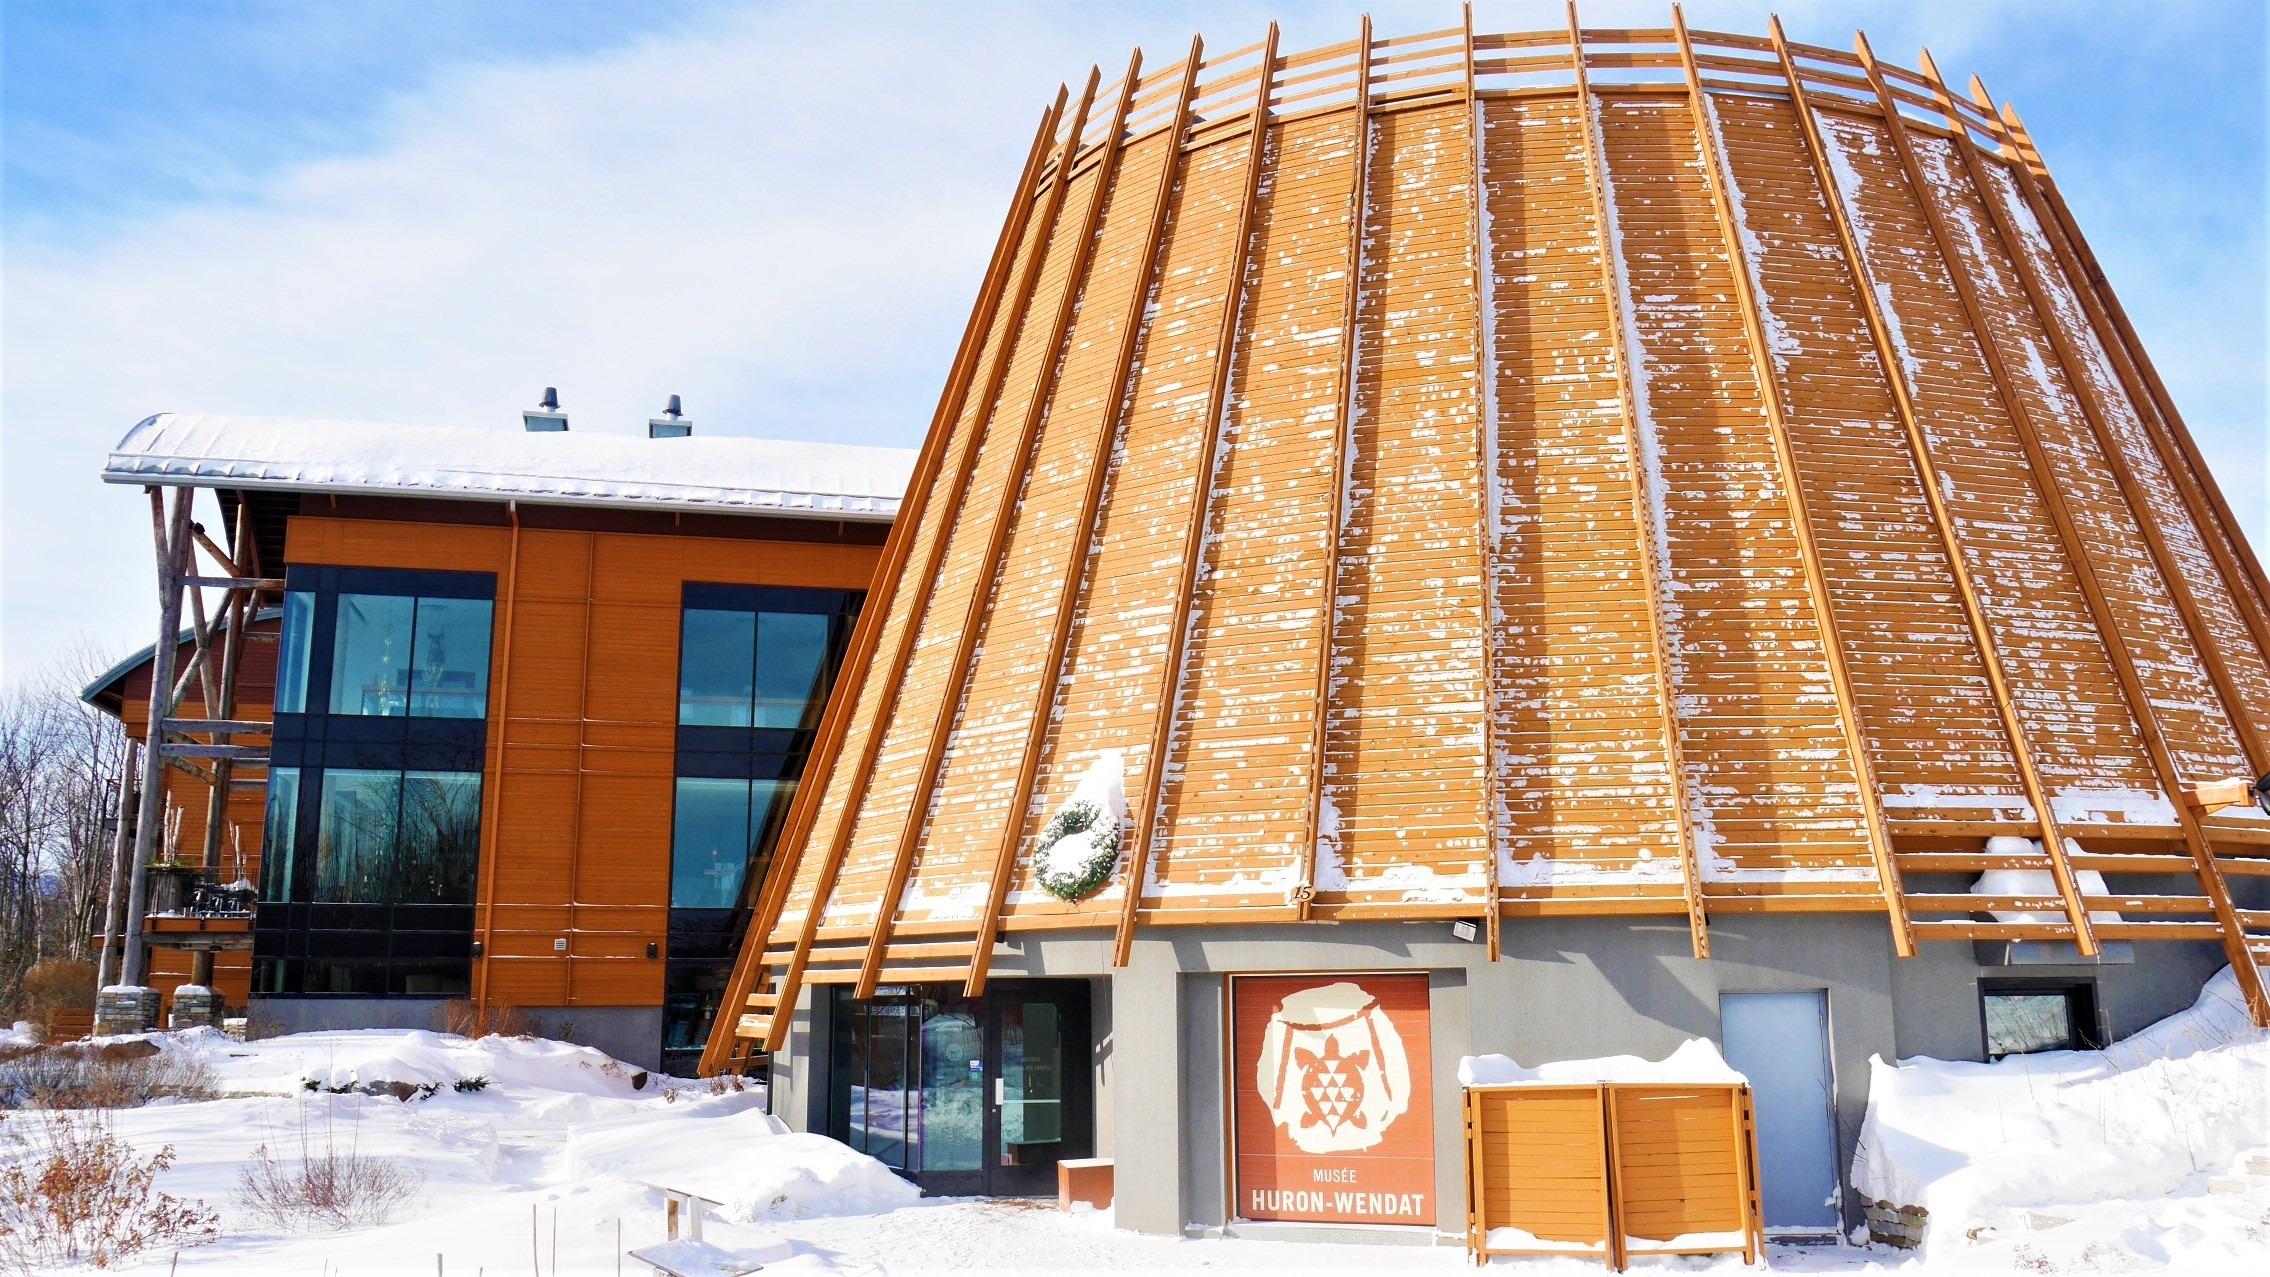 Wendake visiter musee huron Quebec que voir blog voyage canada arpenter le chemin